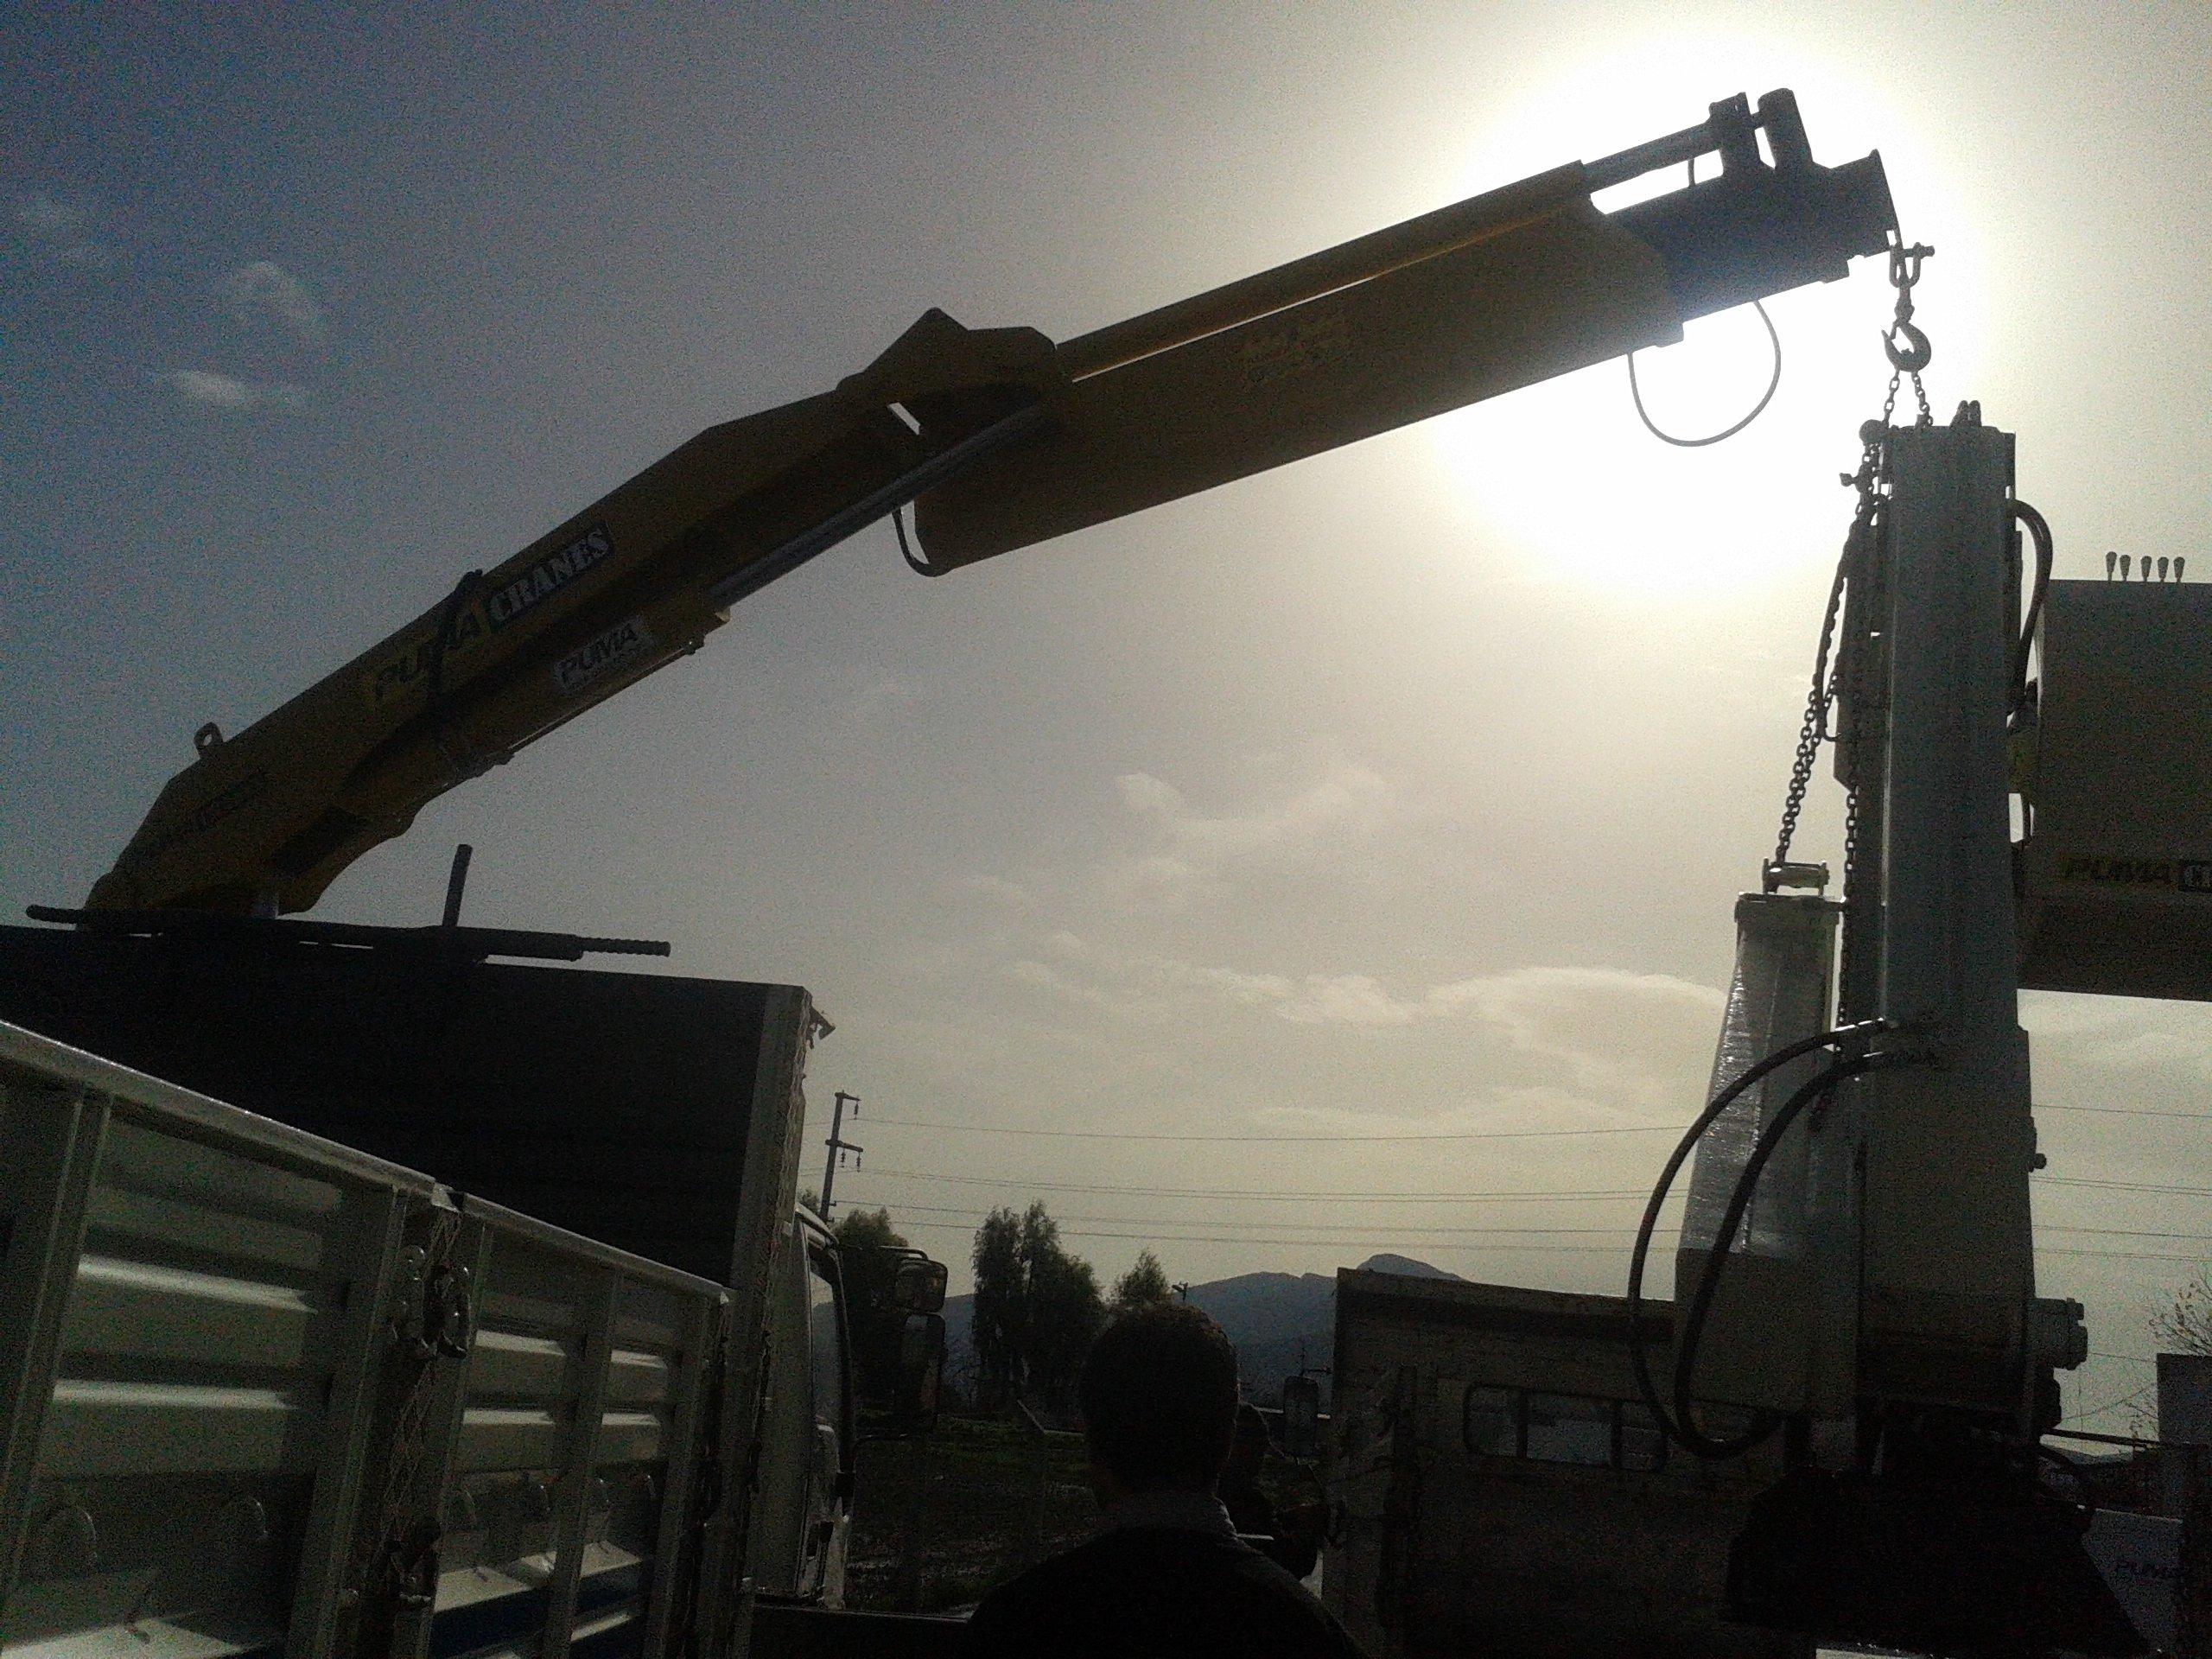 puma-marine-crane444604.jpg